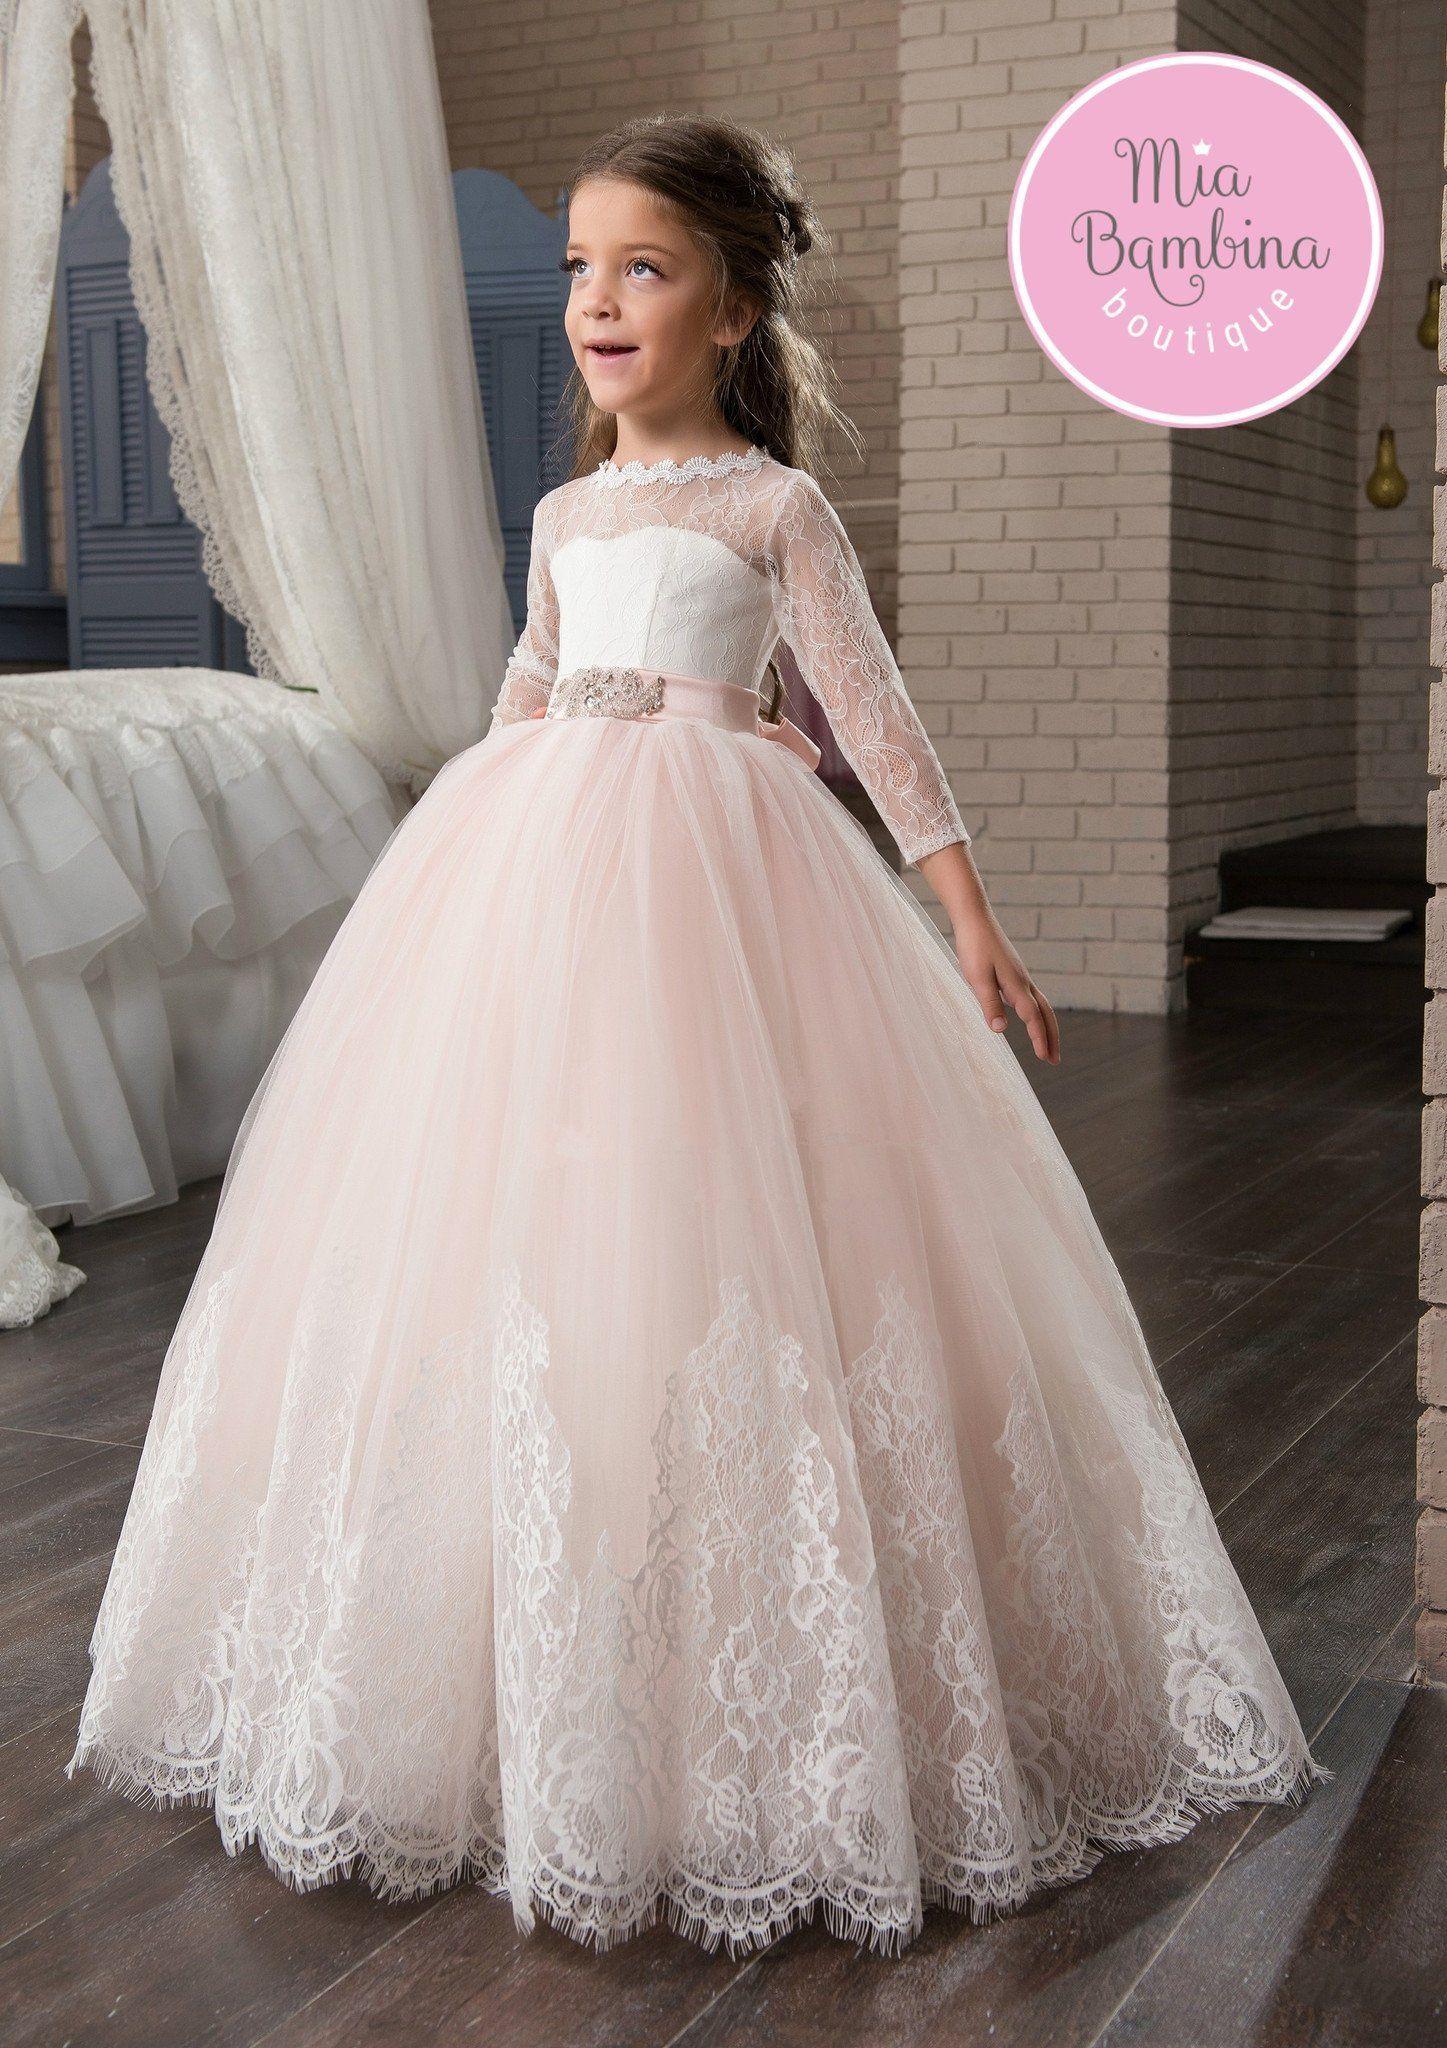 c1e56c7c0b7 The San Bernadino flower girl dress features a floor-length princess  silhouette